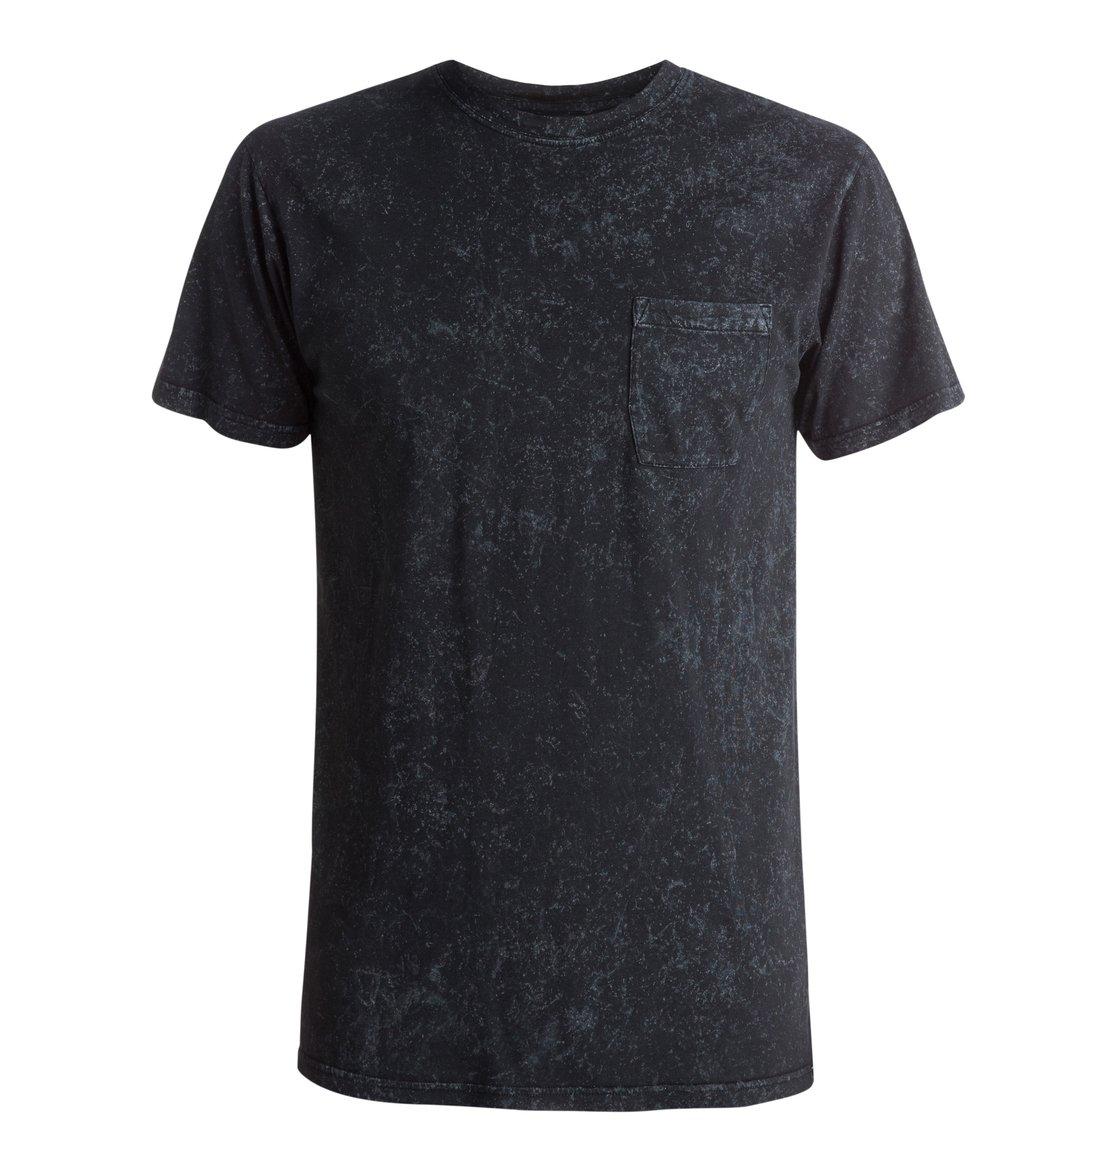 Robbins T-Shirt